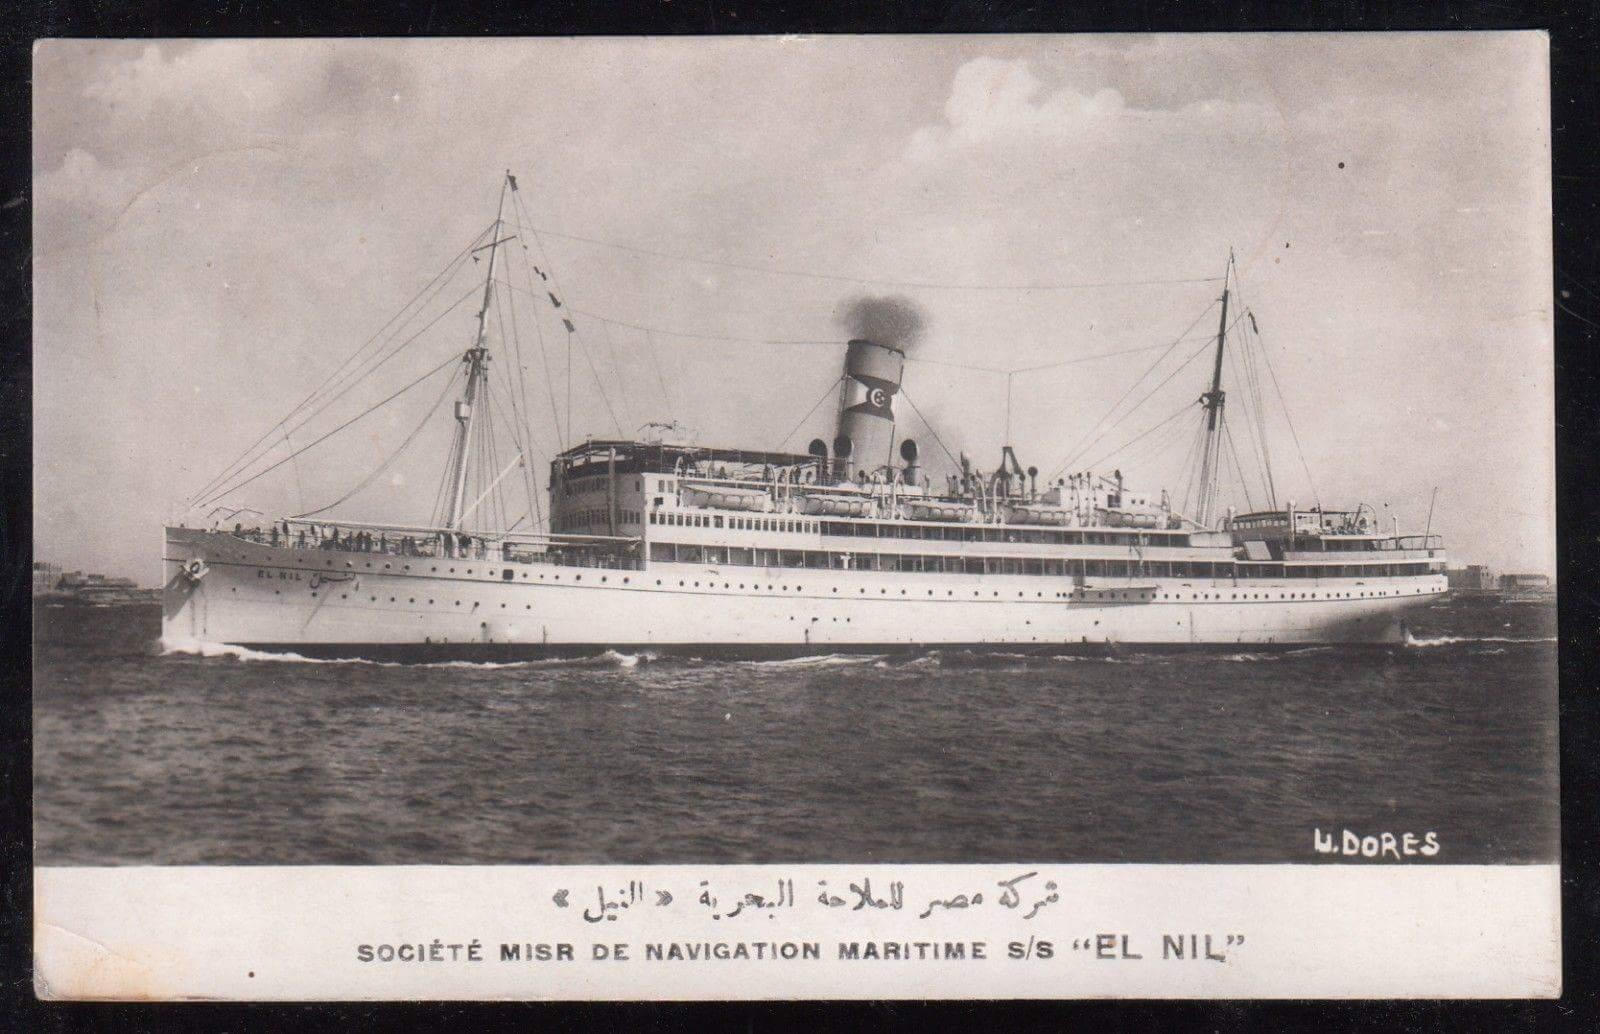 1937 Misr navigation maritime company.jpg 1937 SS el-Nil ship https://m.facebook.com/alexandria1900/photos/a.364092033619757/2235905146438427/